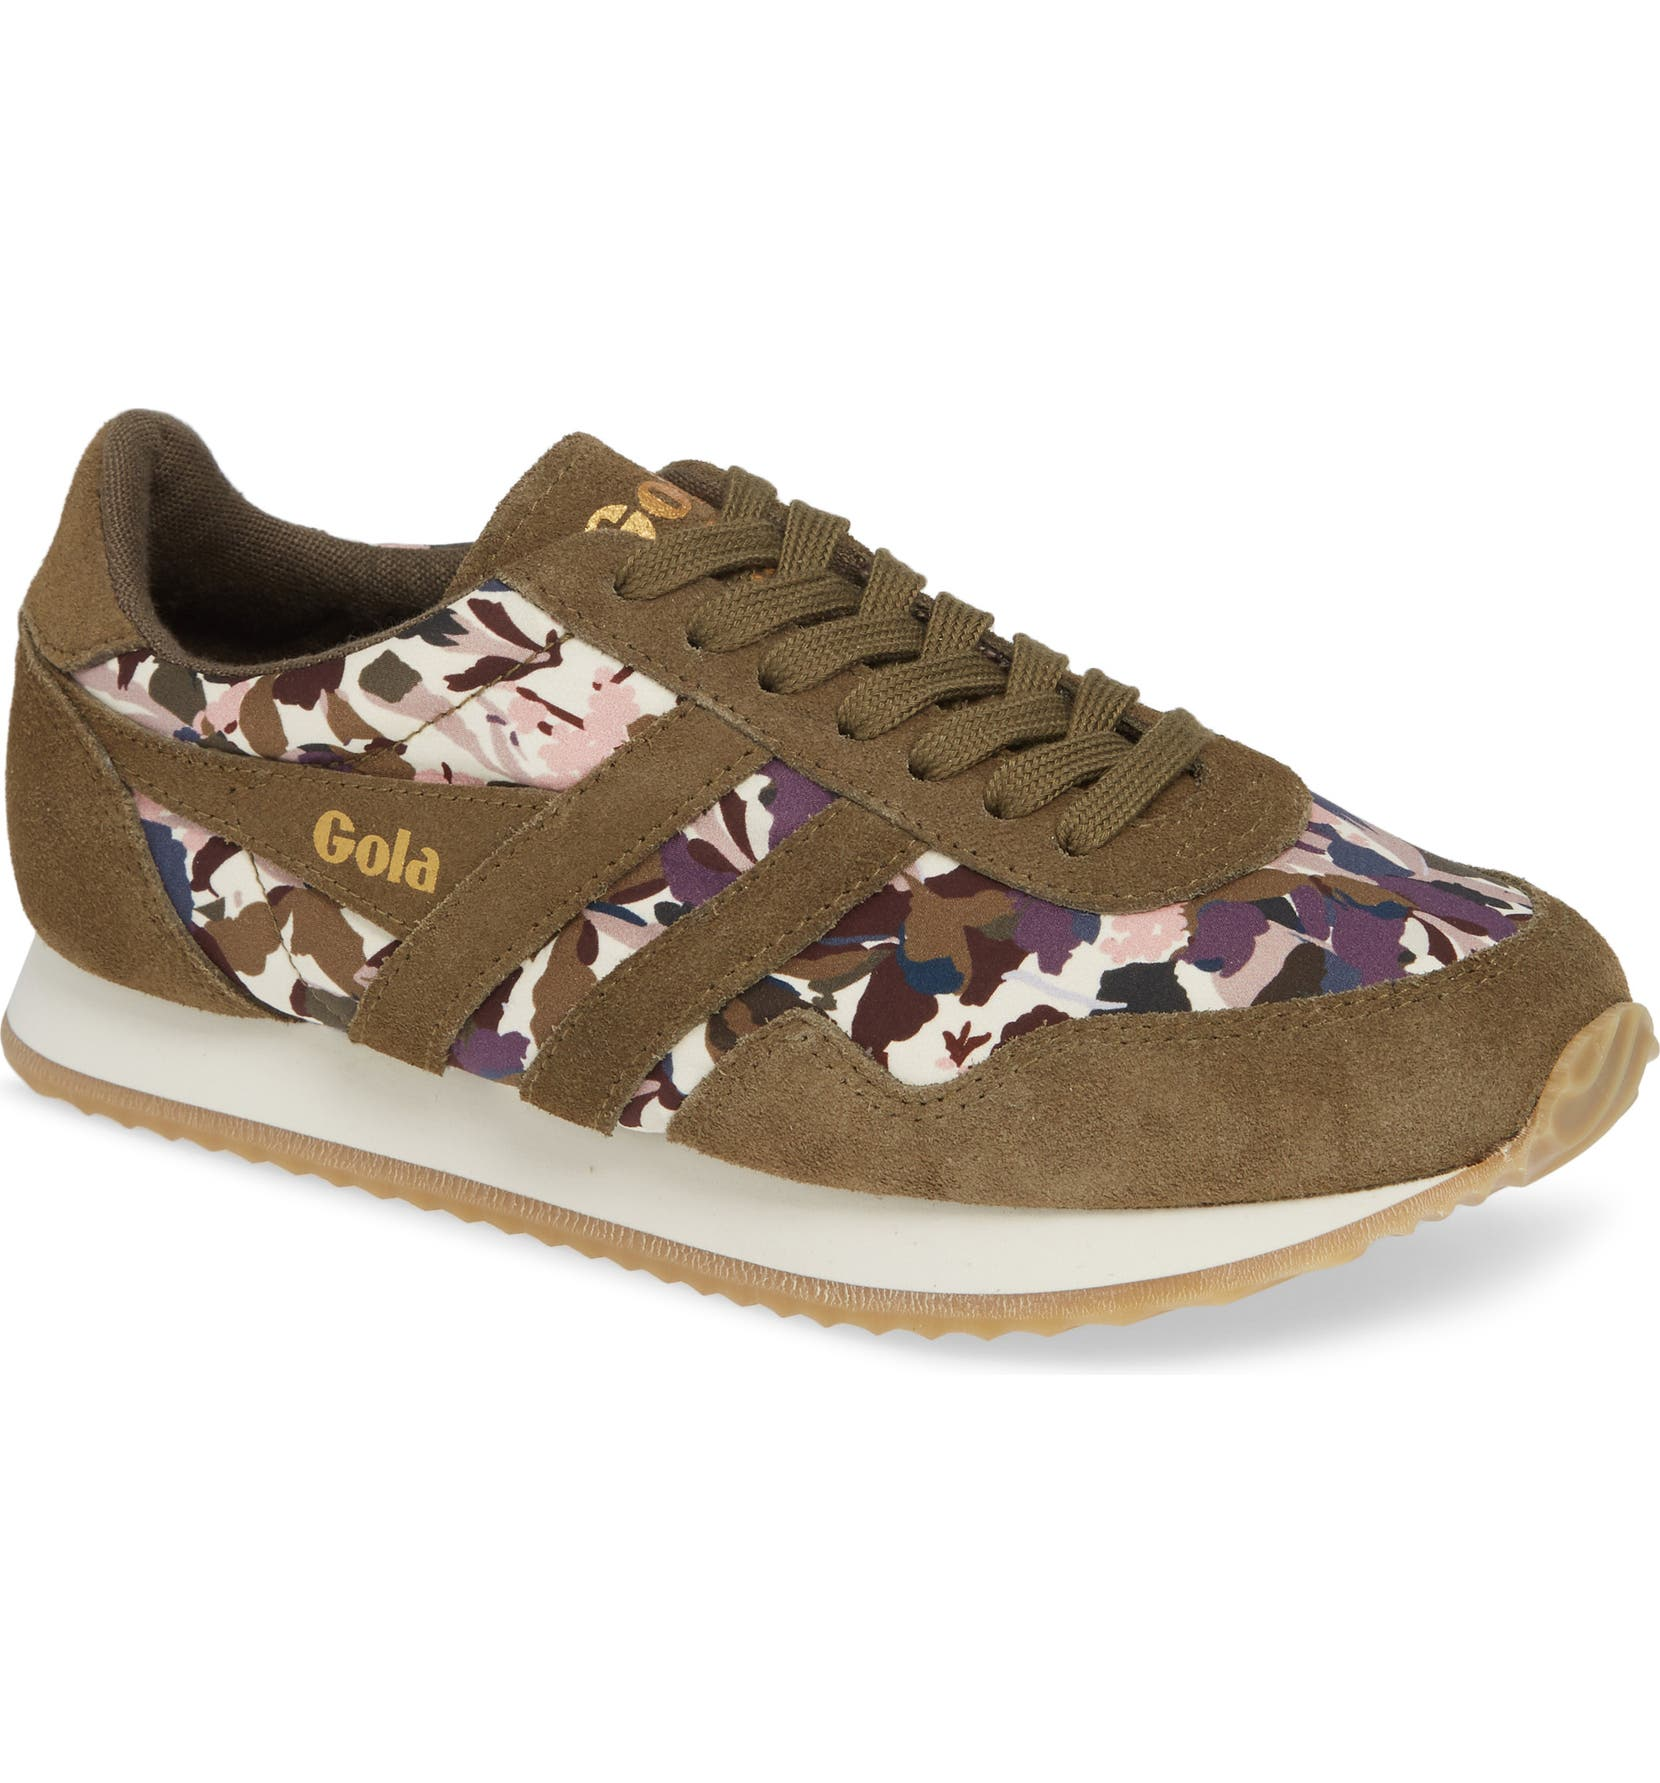 Gola x Liberty Fabrics Collection Bullet Sneaker (Women)  542638ca4